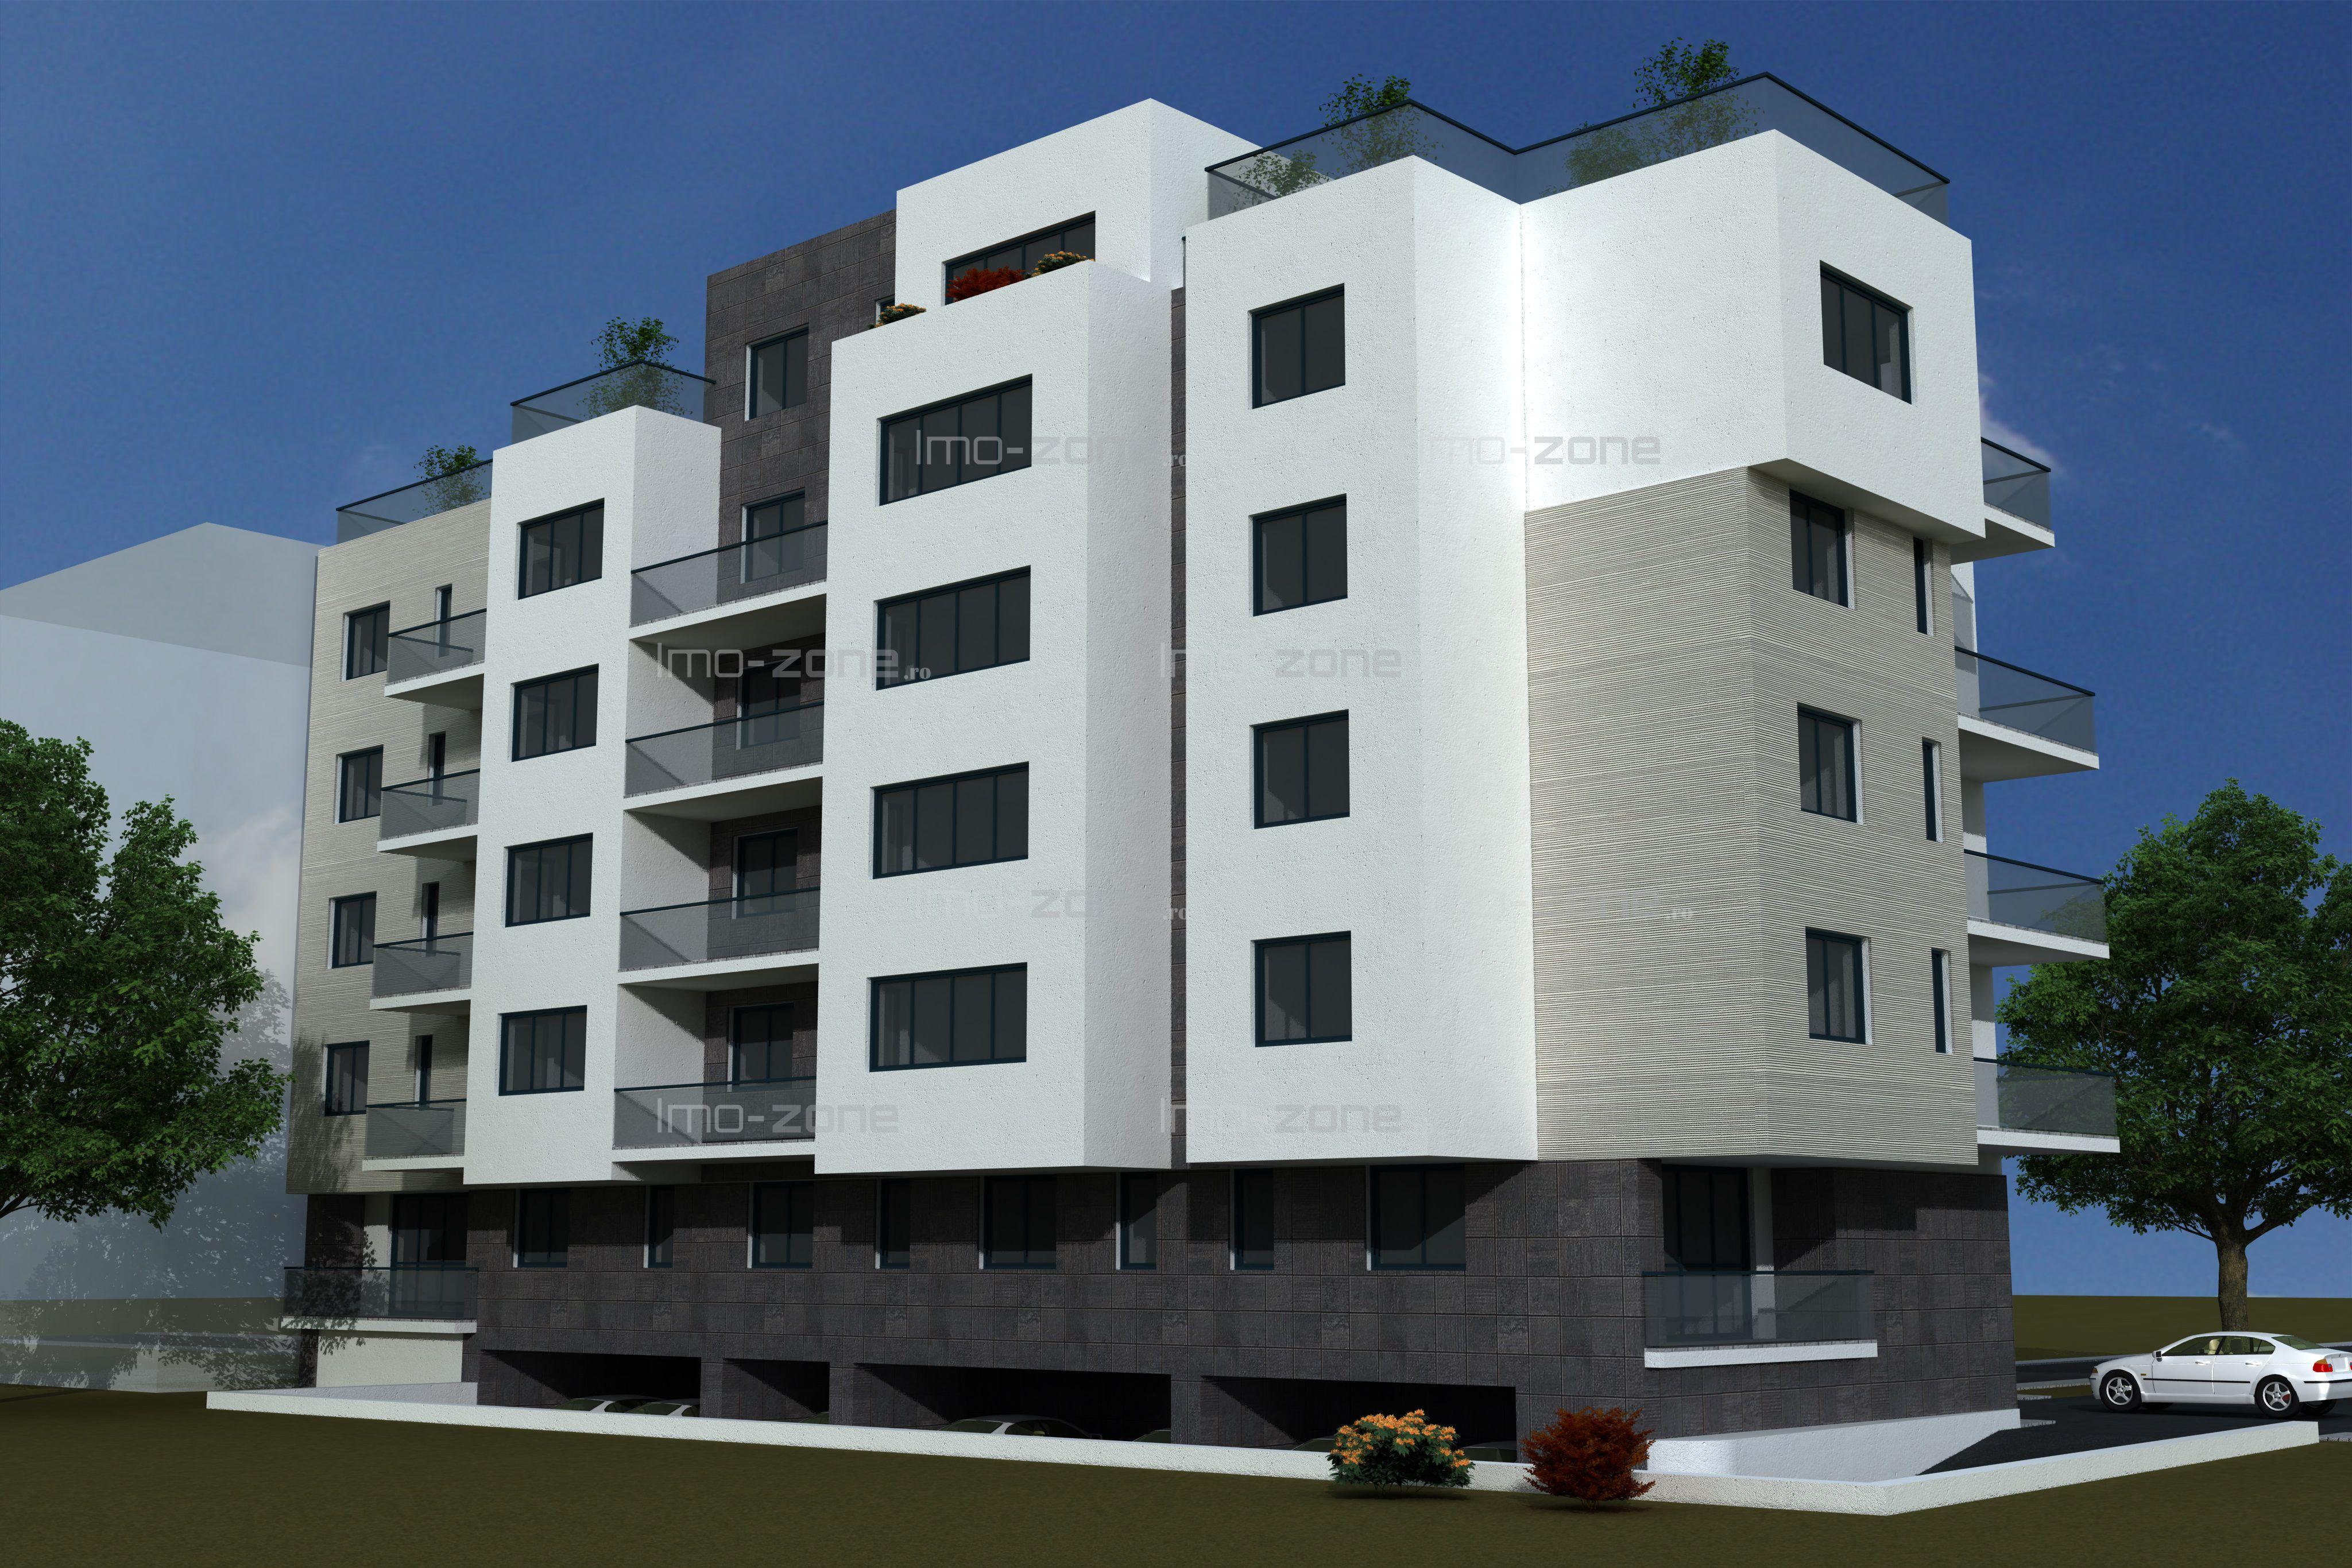 Apartament 3 camere, decomandat, finisat, 2 bai, metrou 4 minute, comision 0%